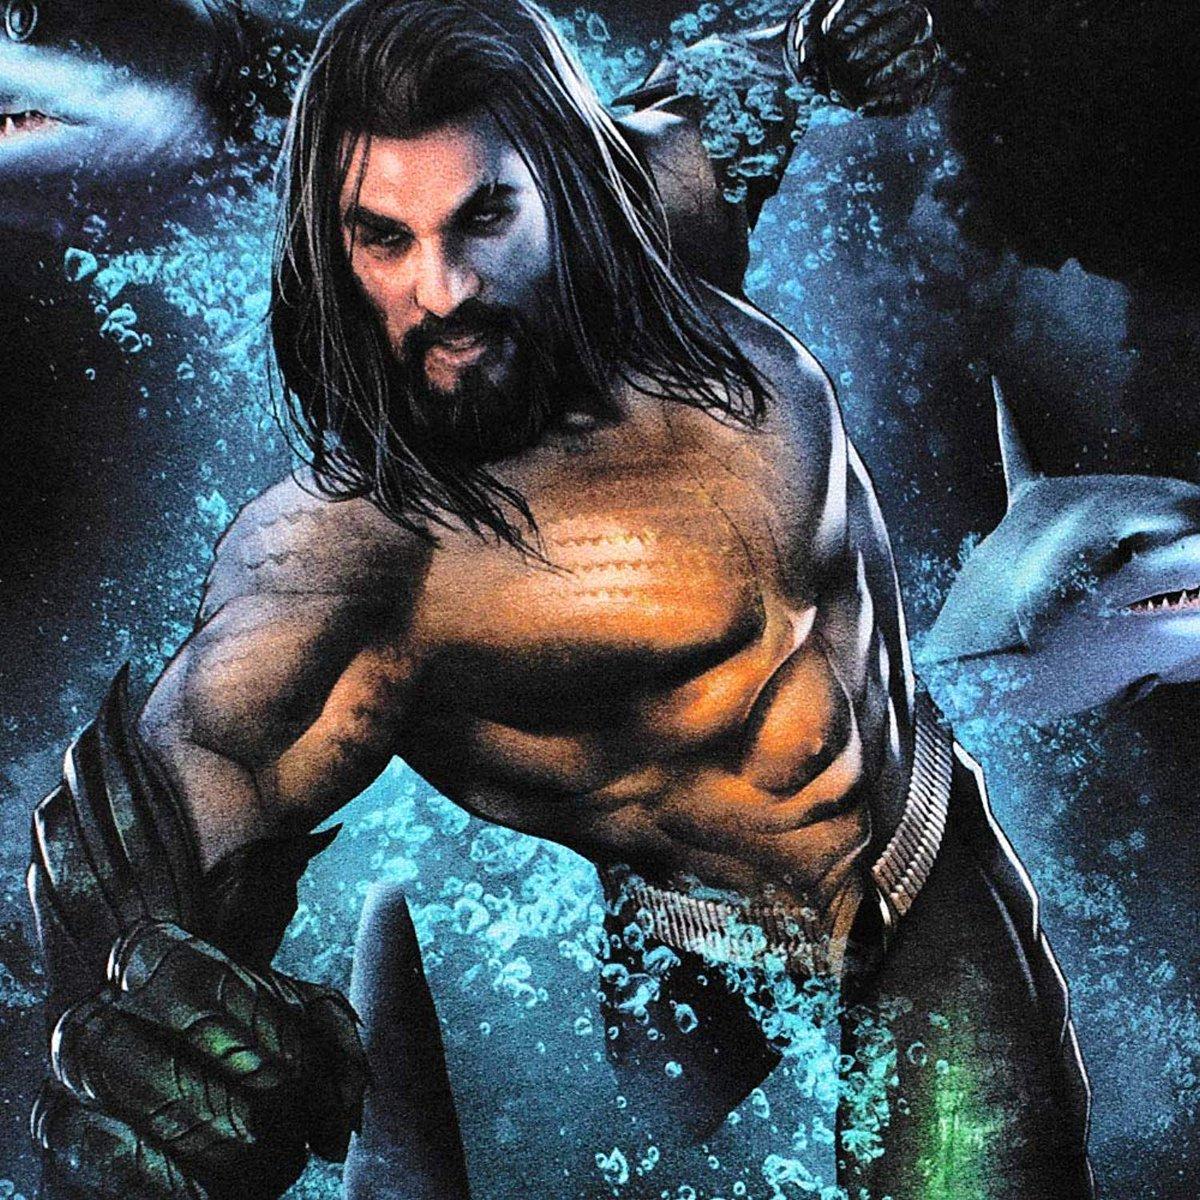 Aquaman New Promo Art Behind The Scenes Stills Comic Book Covers